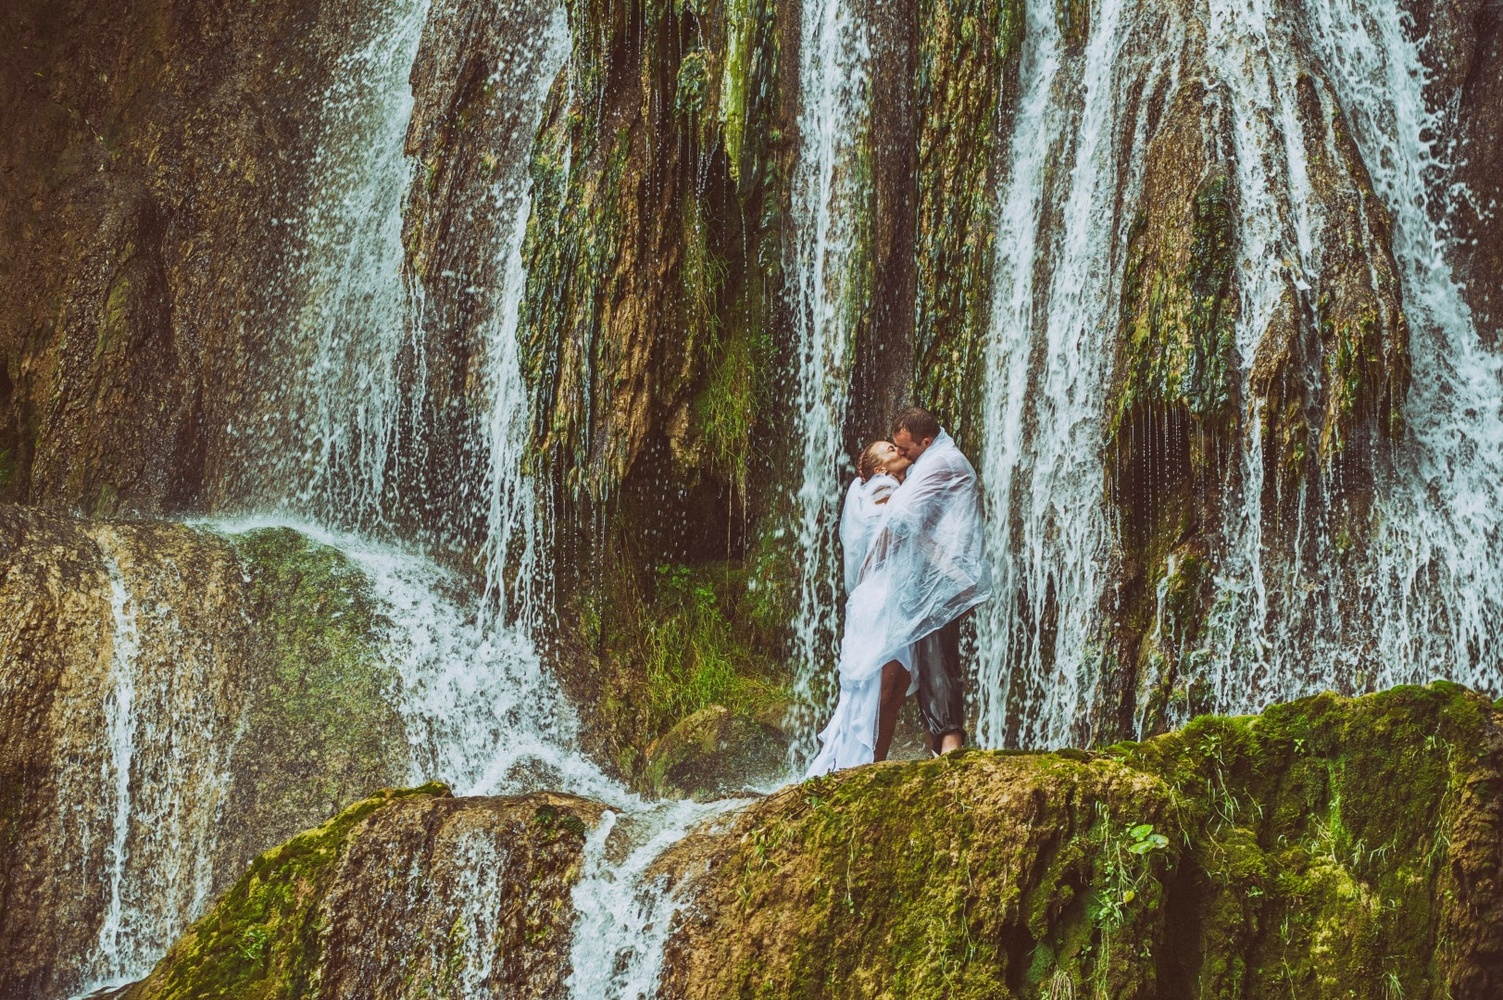 http://www.fotoz.sk/images/gallery-13/normal/eskuvo_vintop-karko_317.jpg